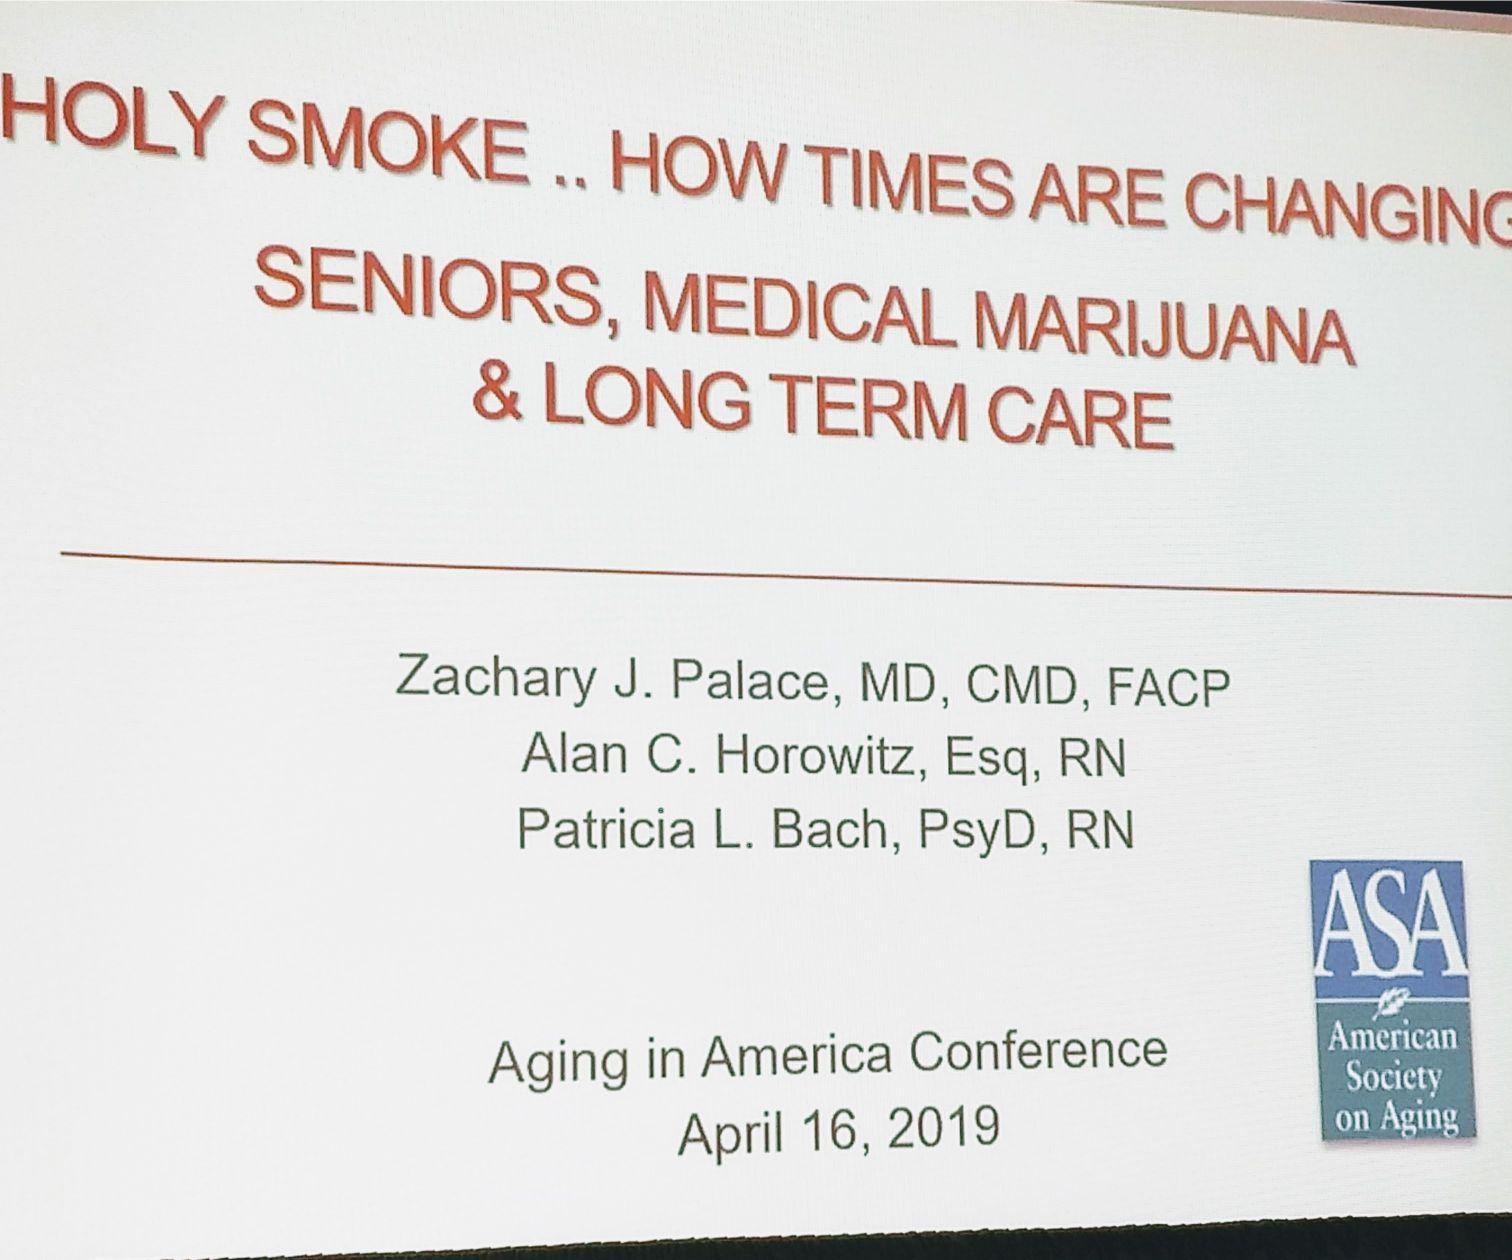 medical marijuana for seniors slide - zachary palace alan c horowitz patricia l bach.jpg